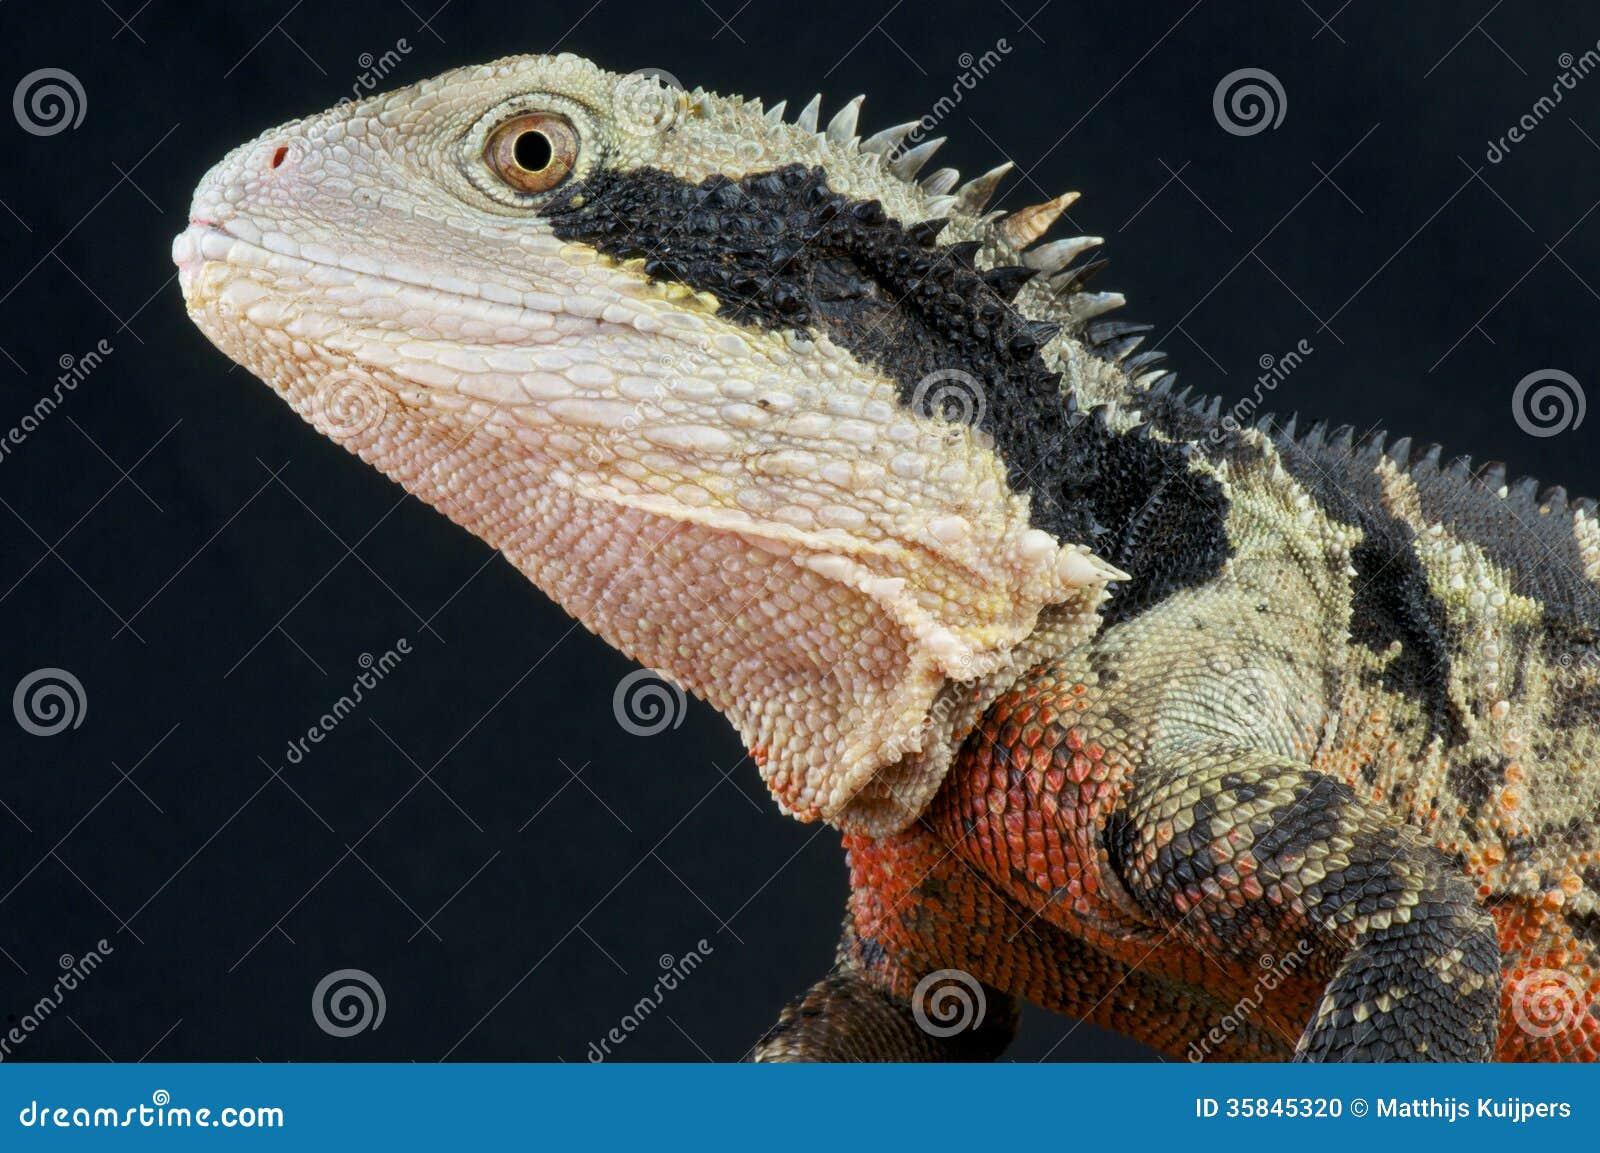 Australian Water Dragon Lizard: Australian Water Dragon / Physignathus Lesueurii Stock